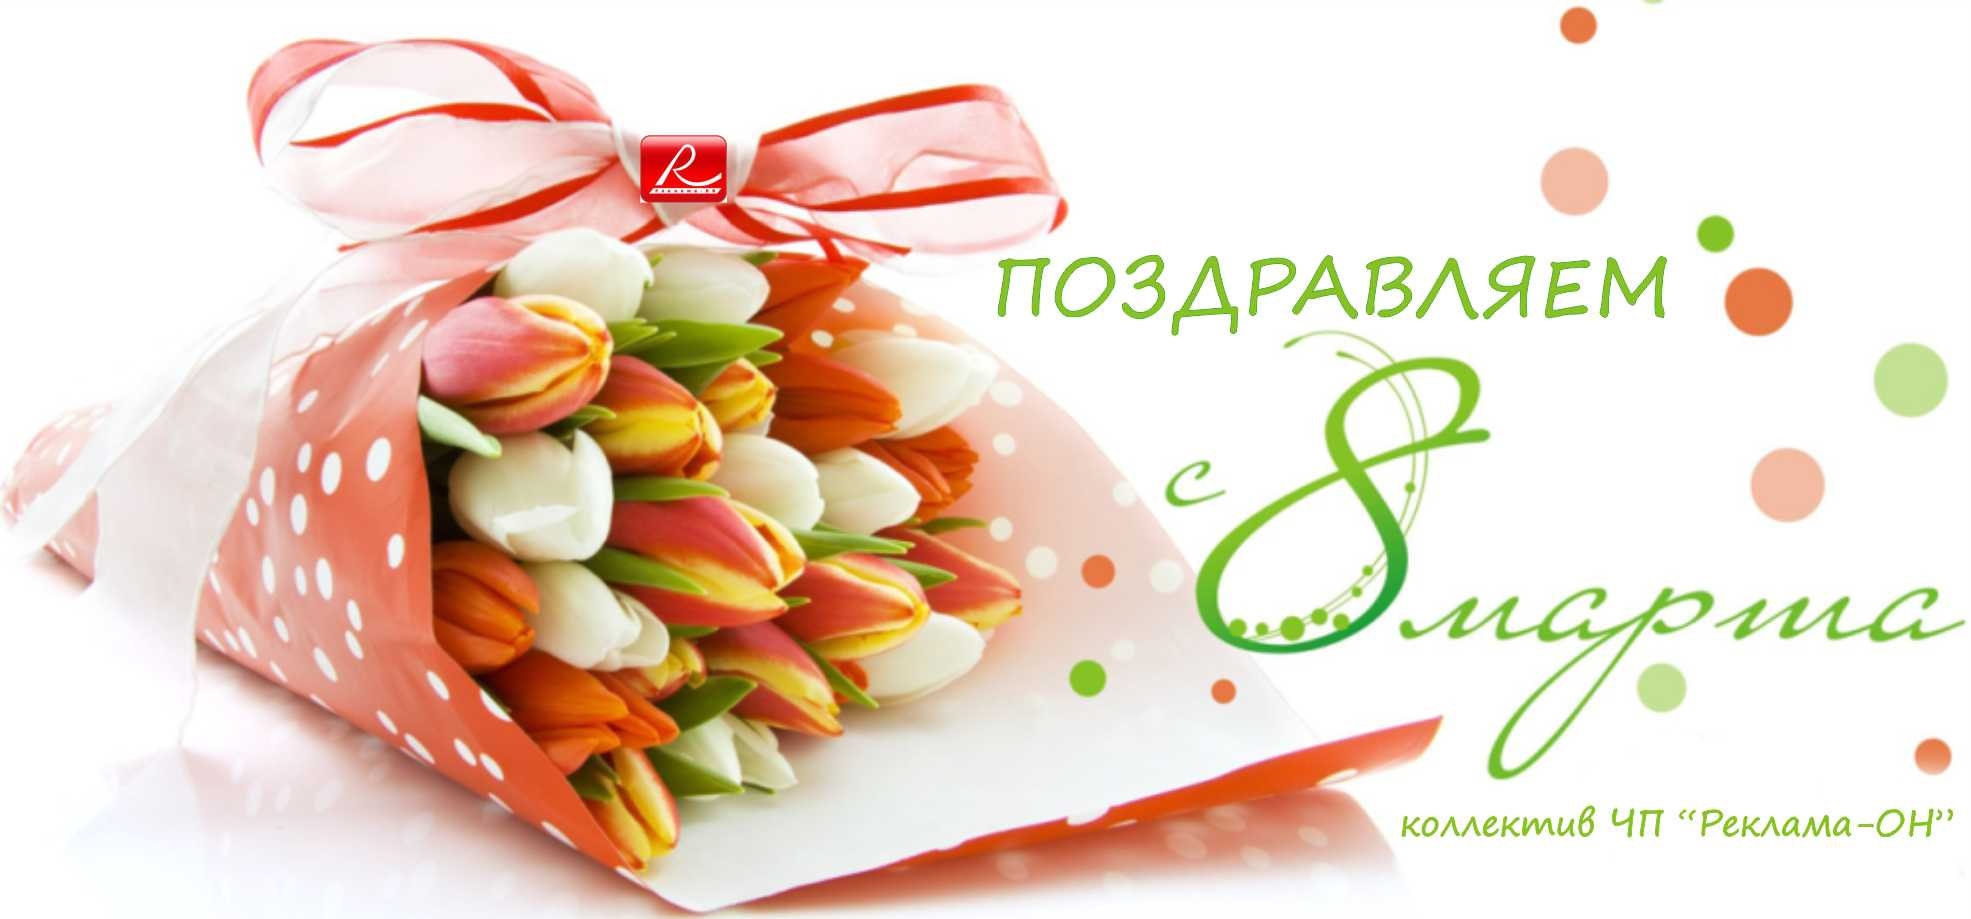 С праздником 8 марта! reklama-on.by